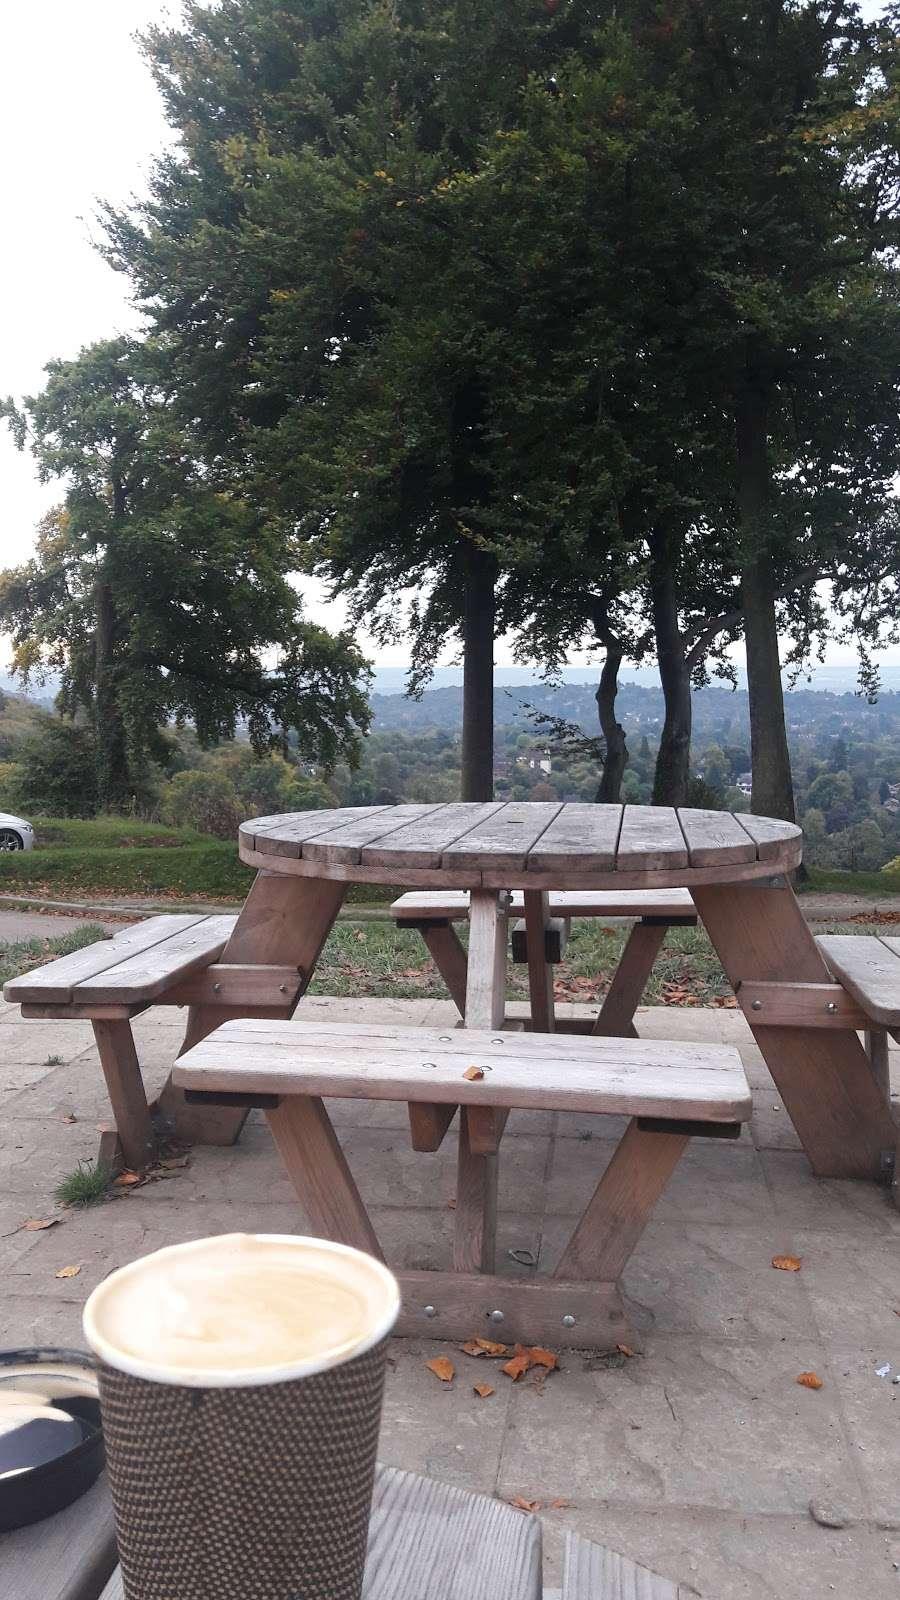 Reigate Hill Tea Room - cafe  | Photo 5 of 10 | Address: Car Park, Reigate Hill Park, Wray Ln, Reigate RH2 0HX, UK